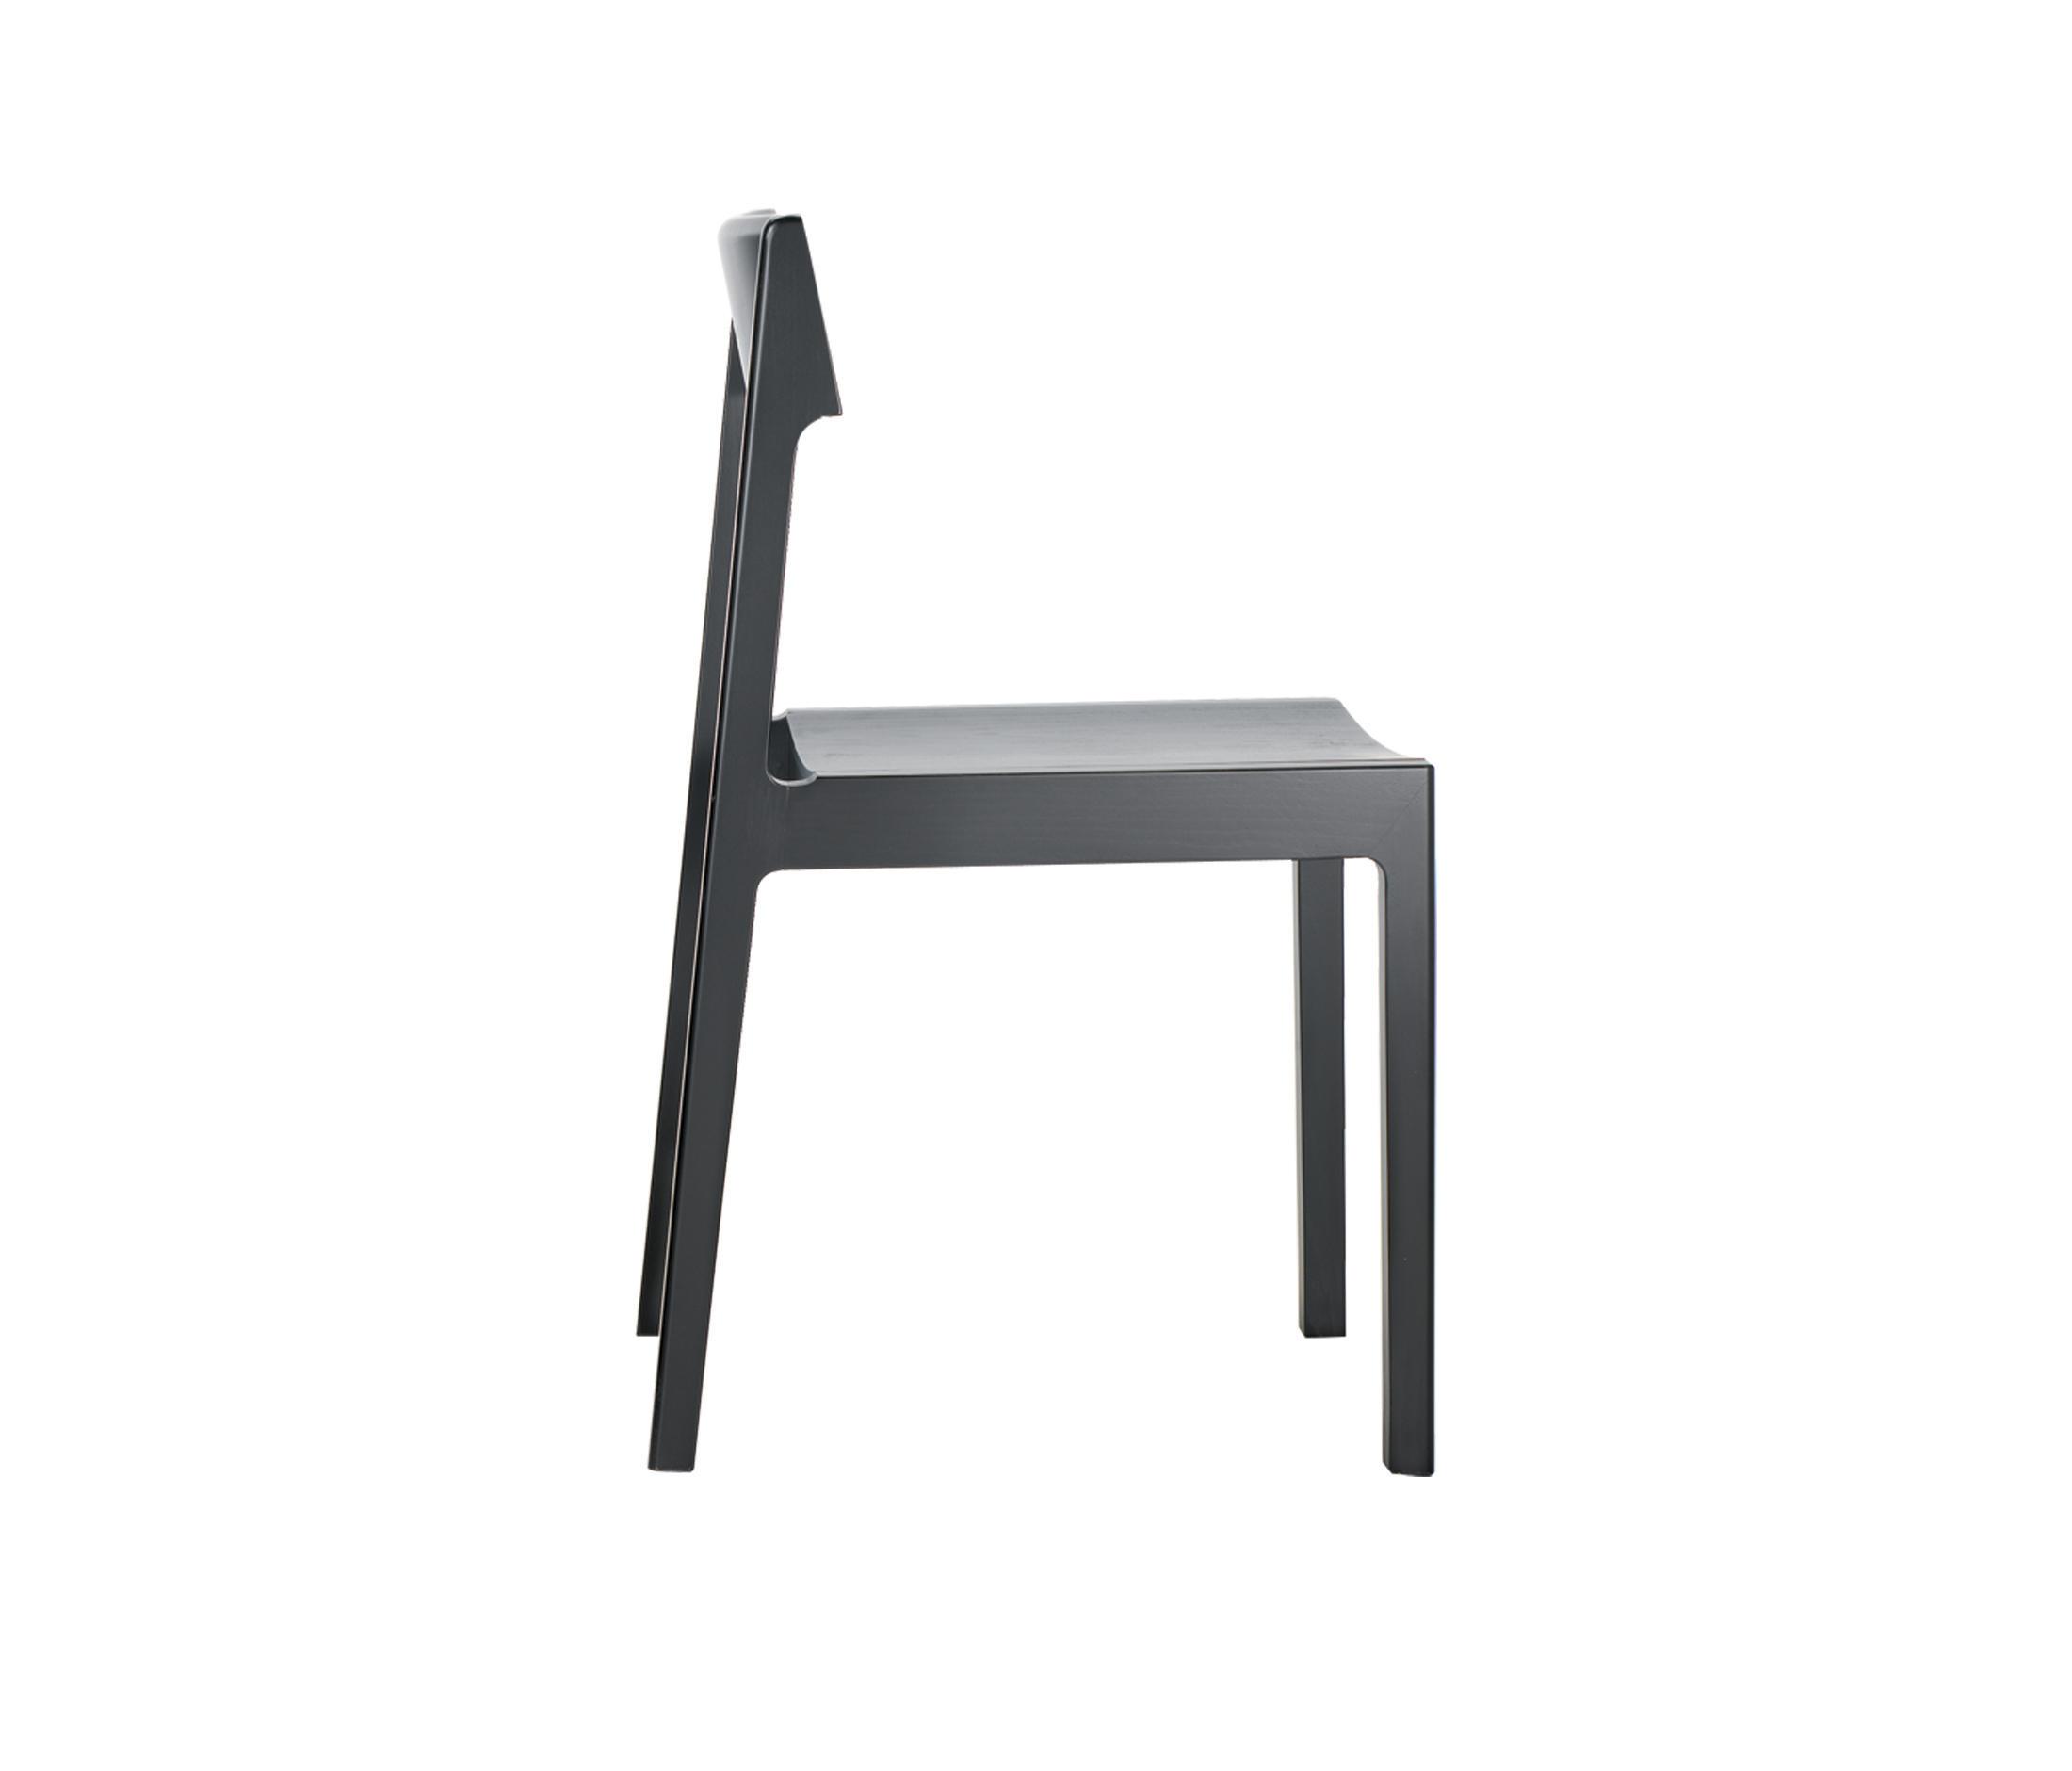 Clip sedia sedie bedont architonic for Rivenditori sedie